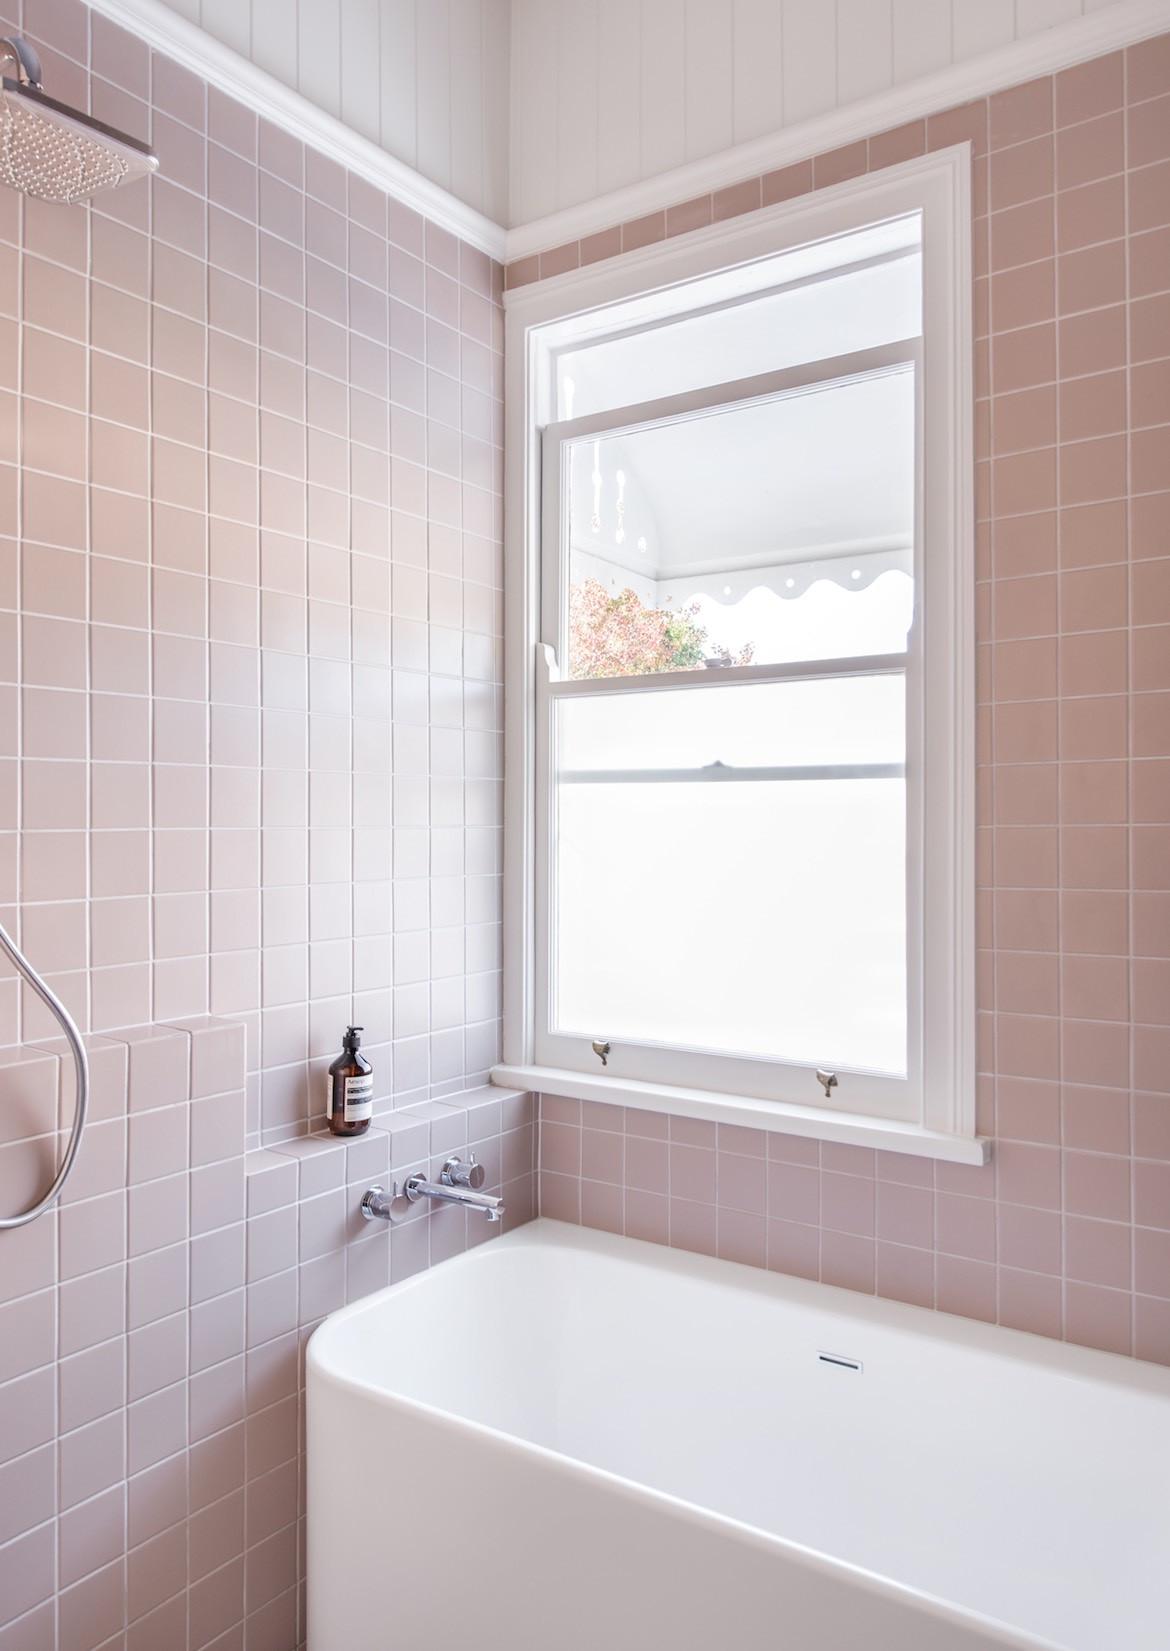 The pale pink bathtub in the Queenslander bathroom.